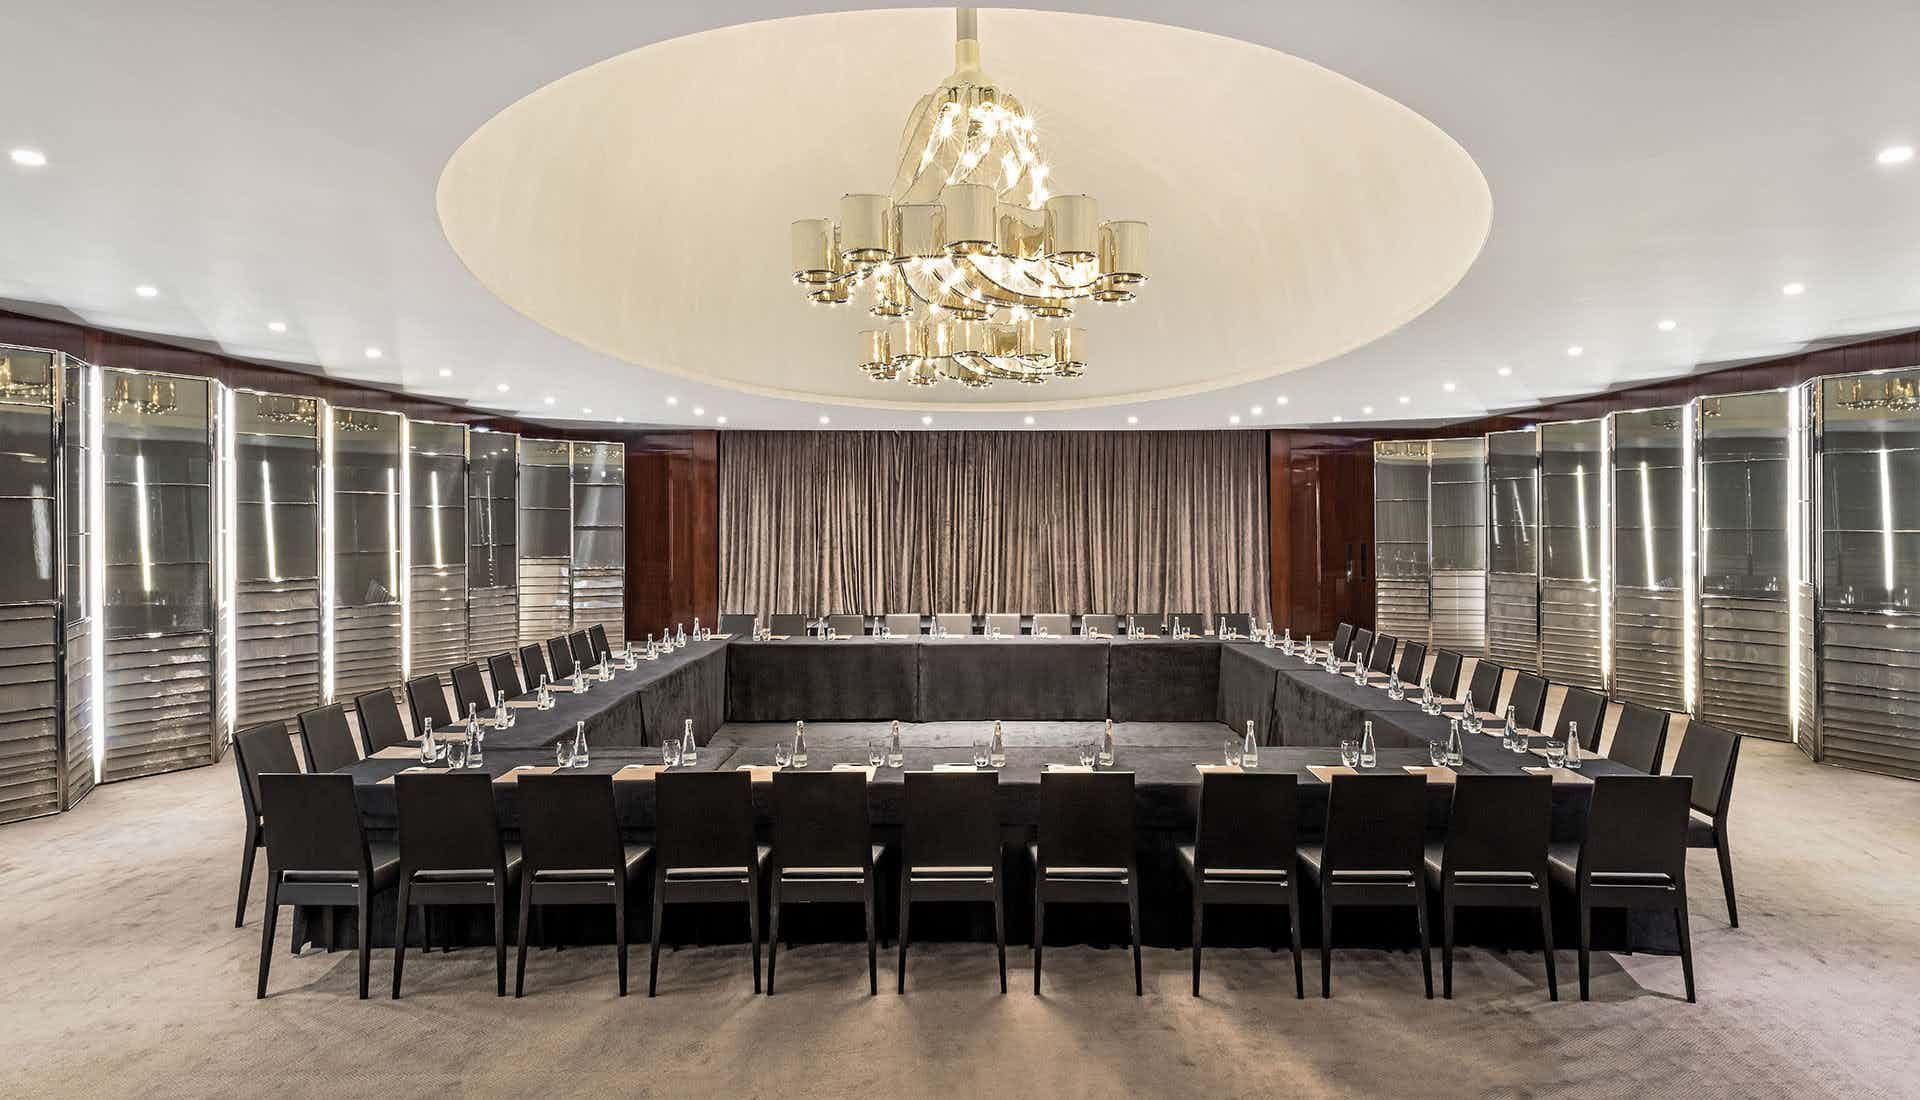 The Ballroom,  Bulgari Hotel, London